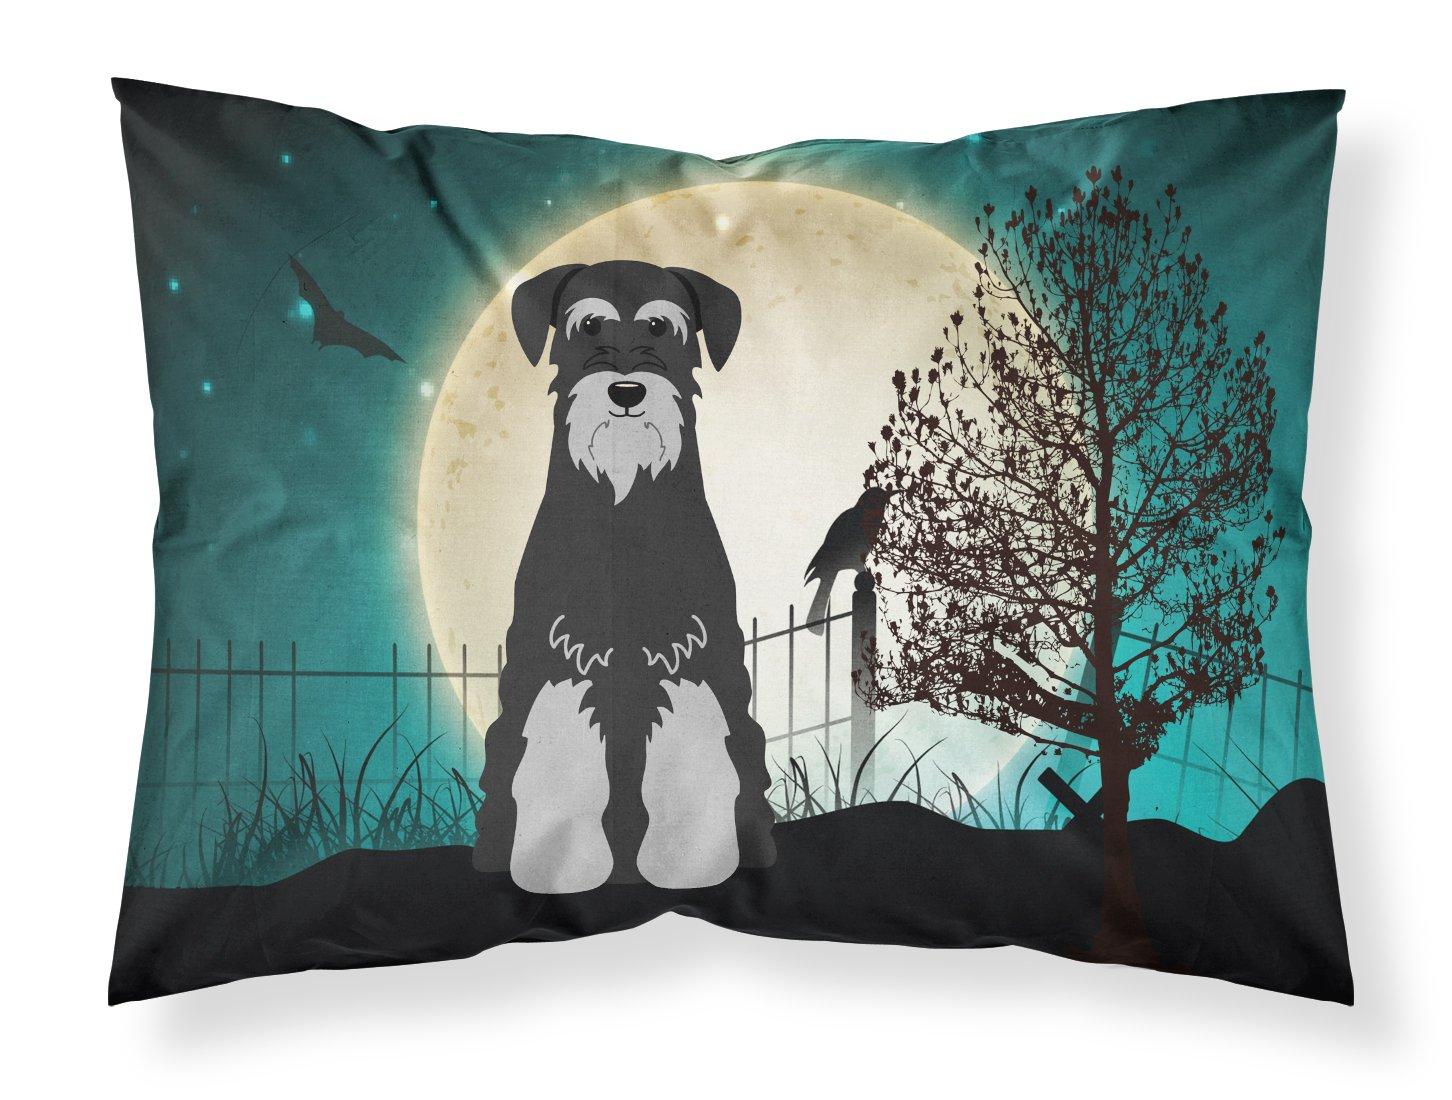 Multicolor Carolines Treasures Halloween Scary Schnauzer Black Grey Fabric Standard Pillowcase BB2224PILLOWCASE